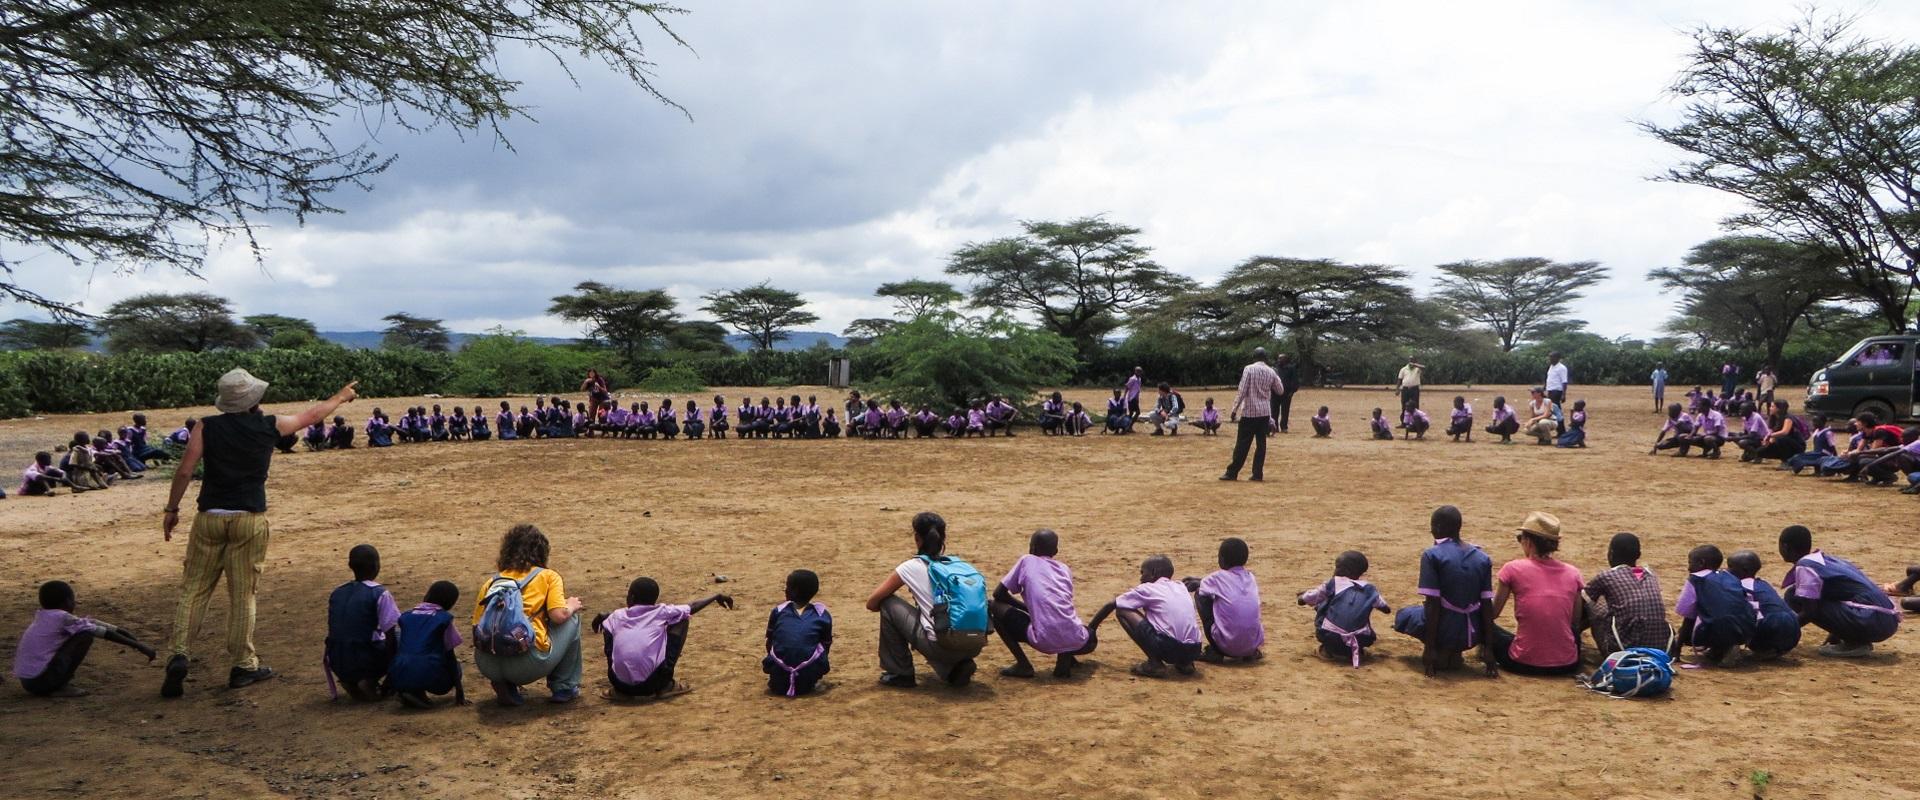 bambini alberi scuola Kenya Mani Tese 2017